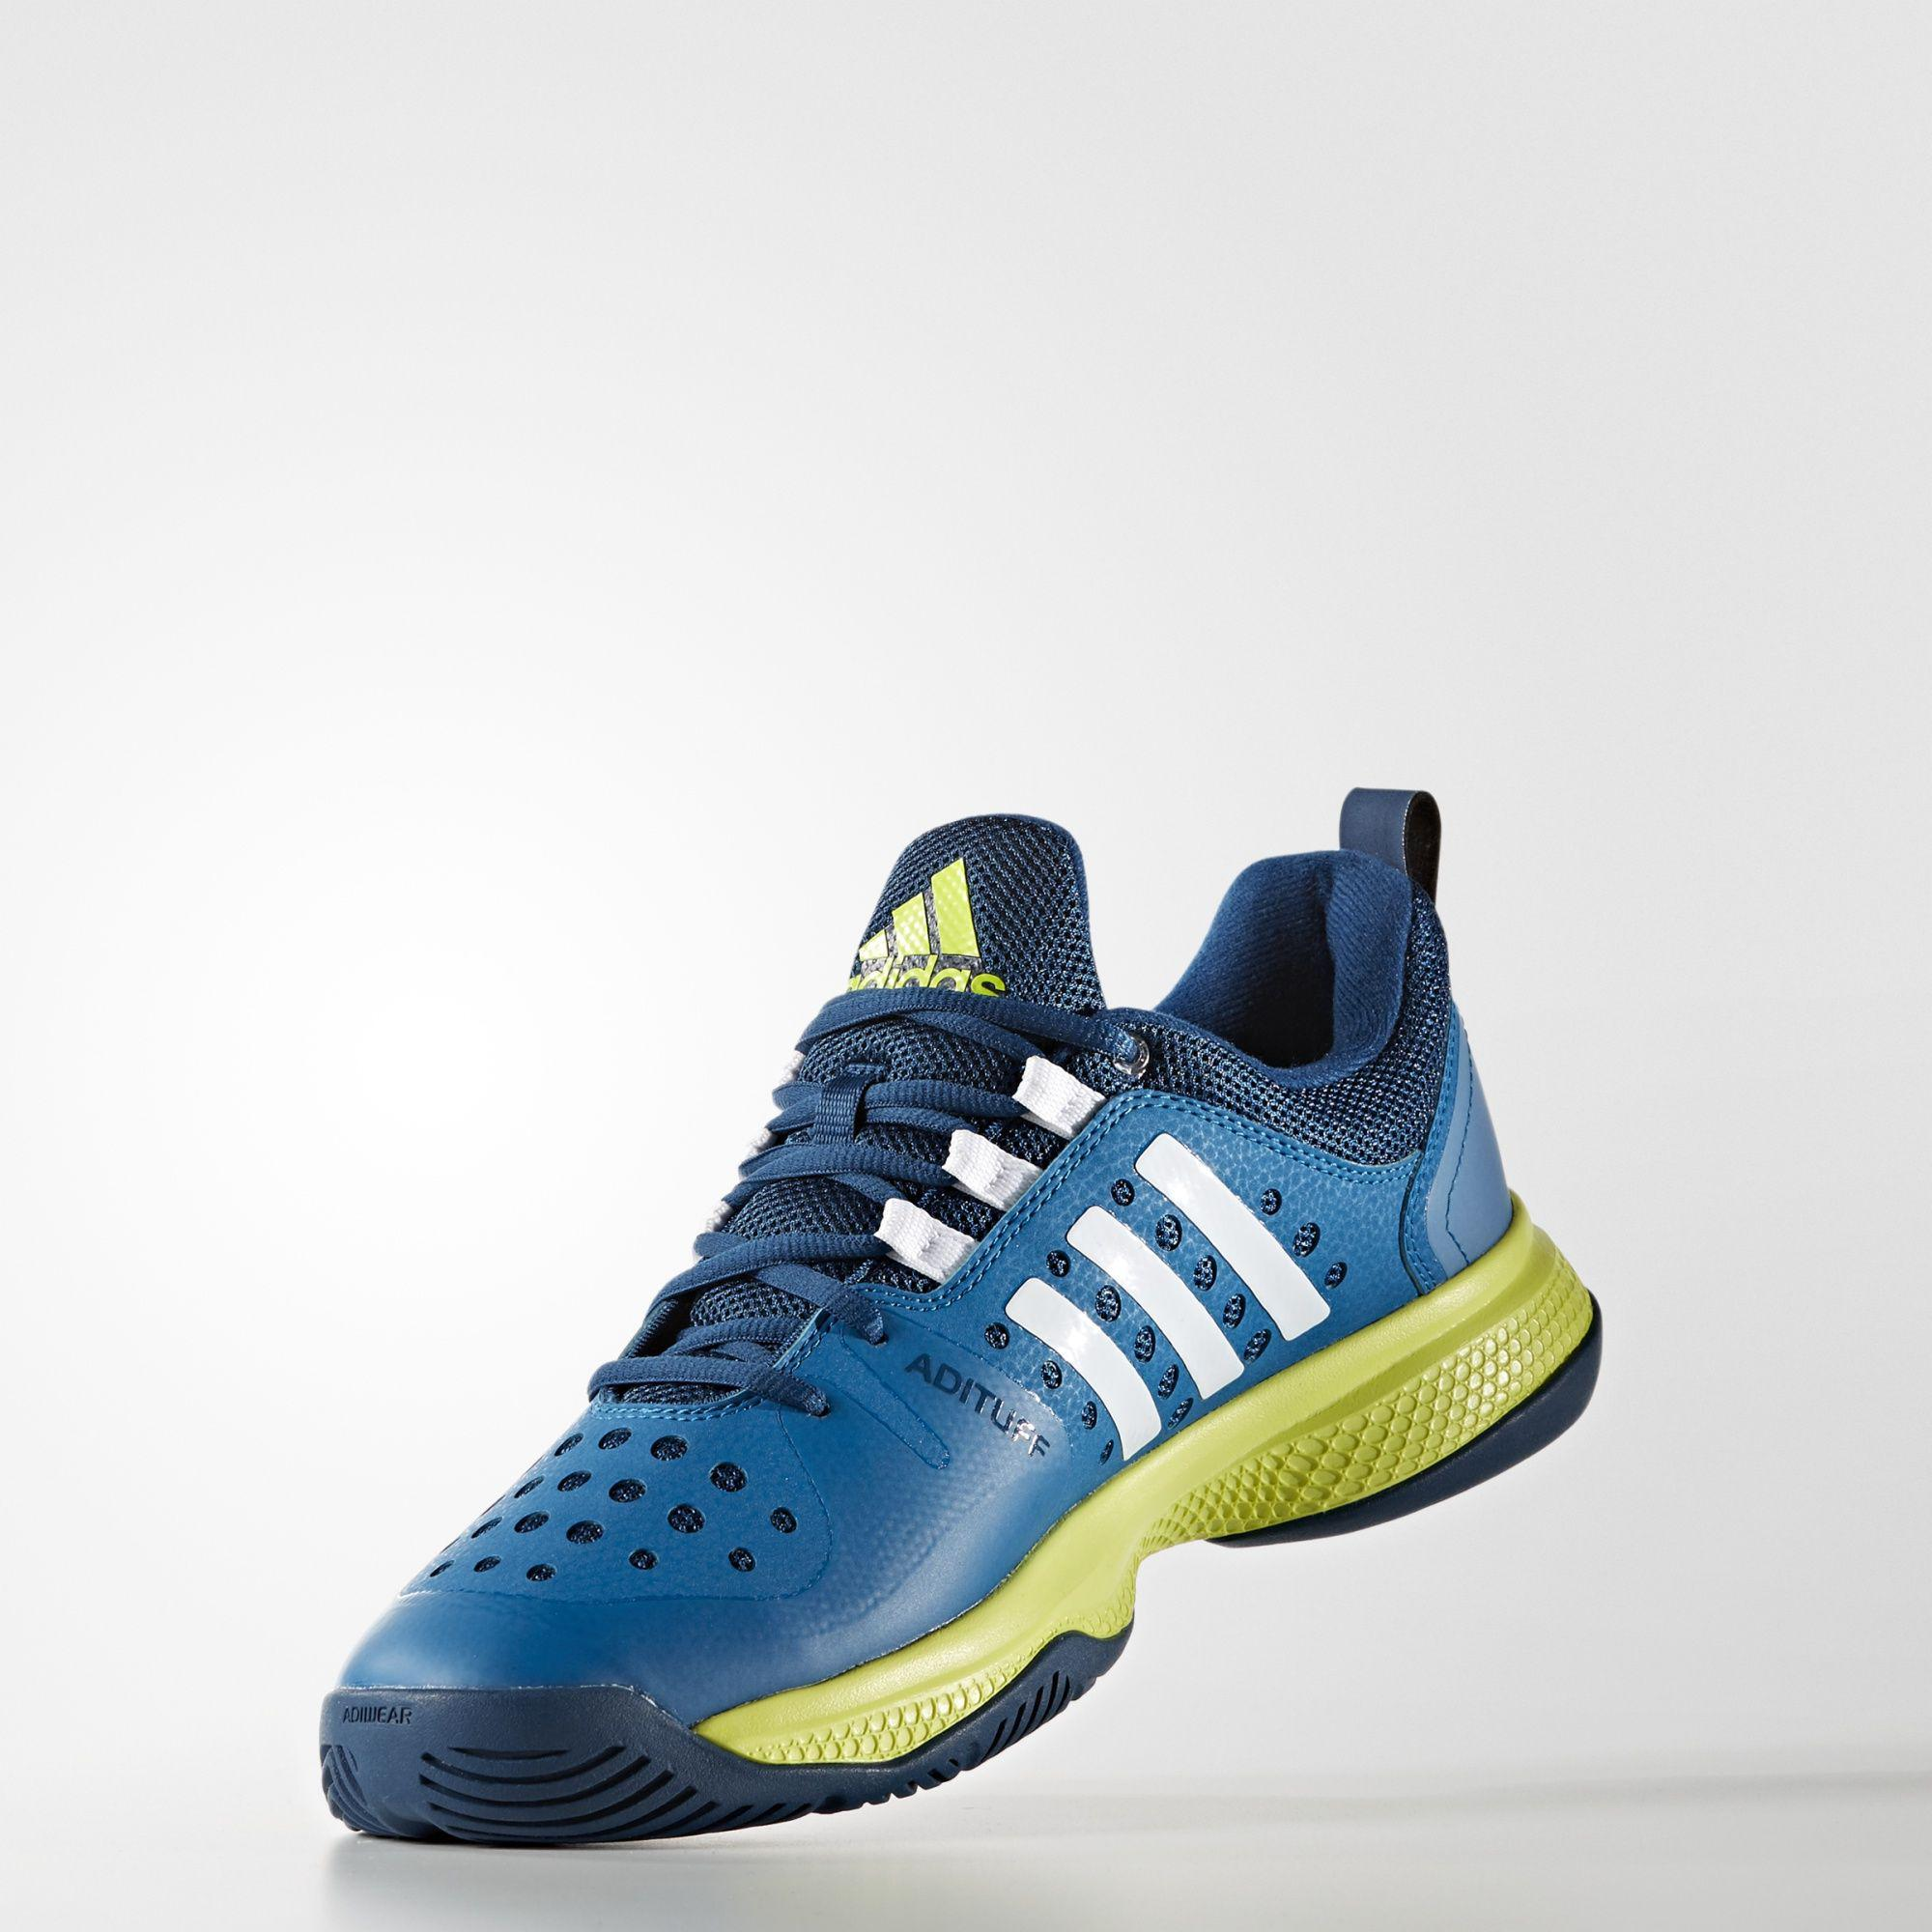 a2a121afa Adidas Mens Barricade Classic Bounce Tennis Shoes - Blue Green ...